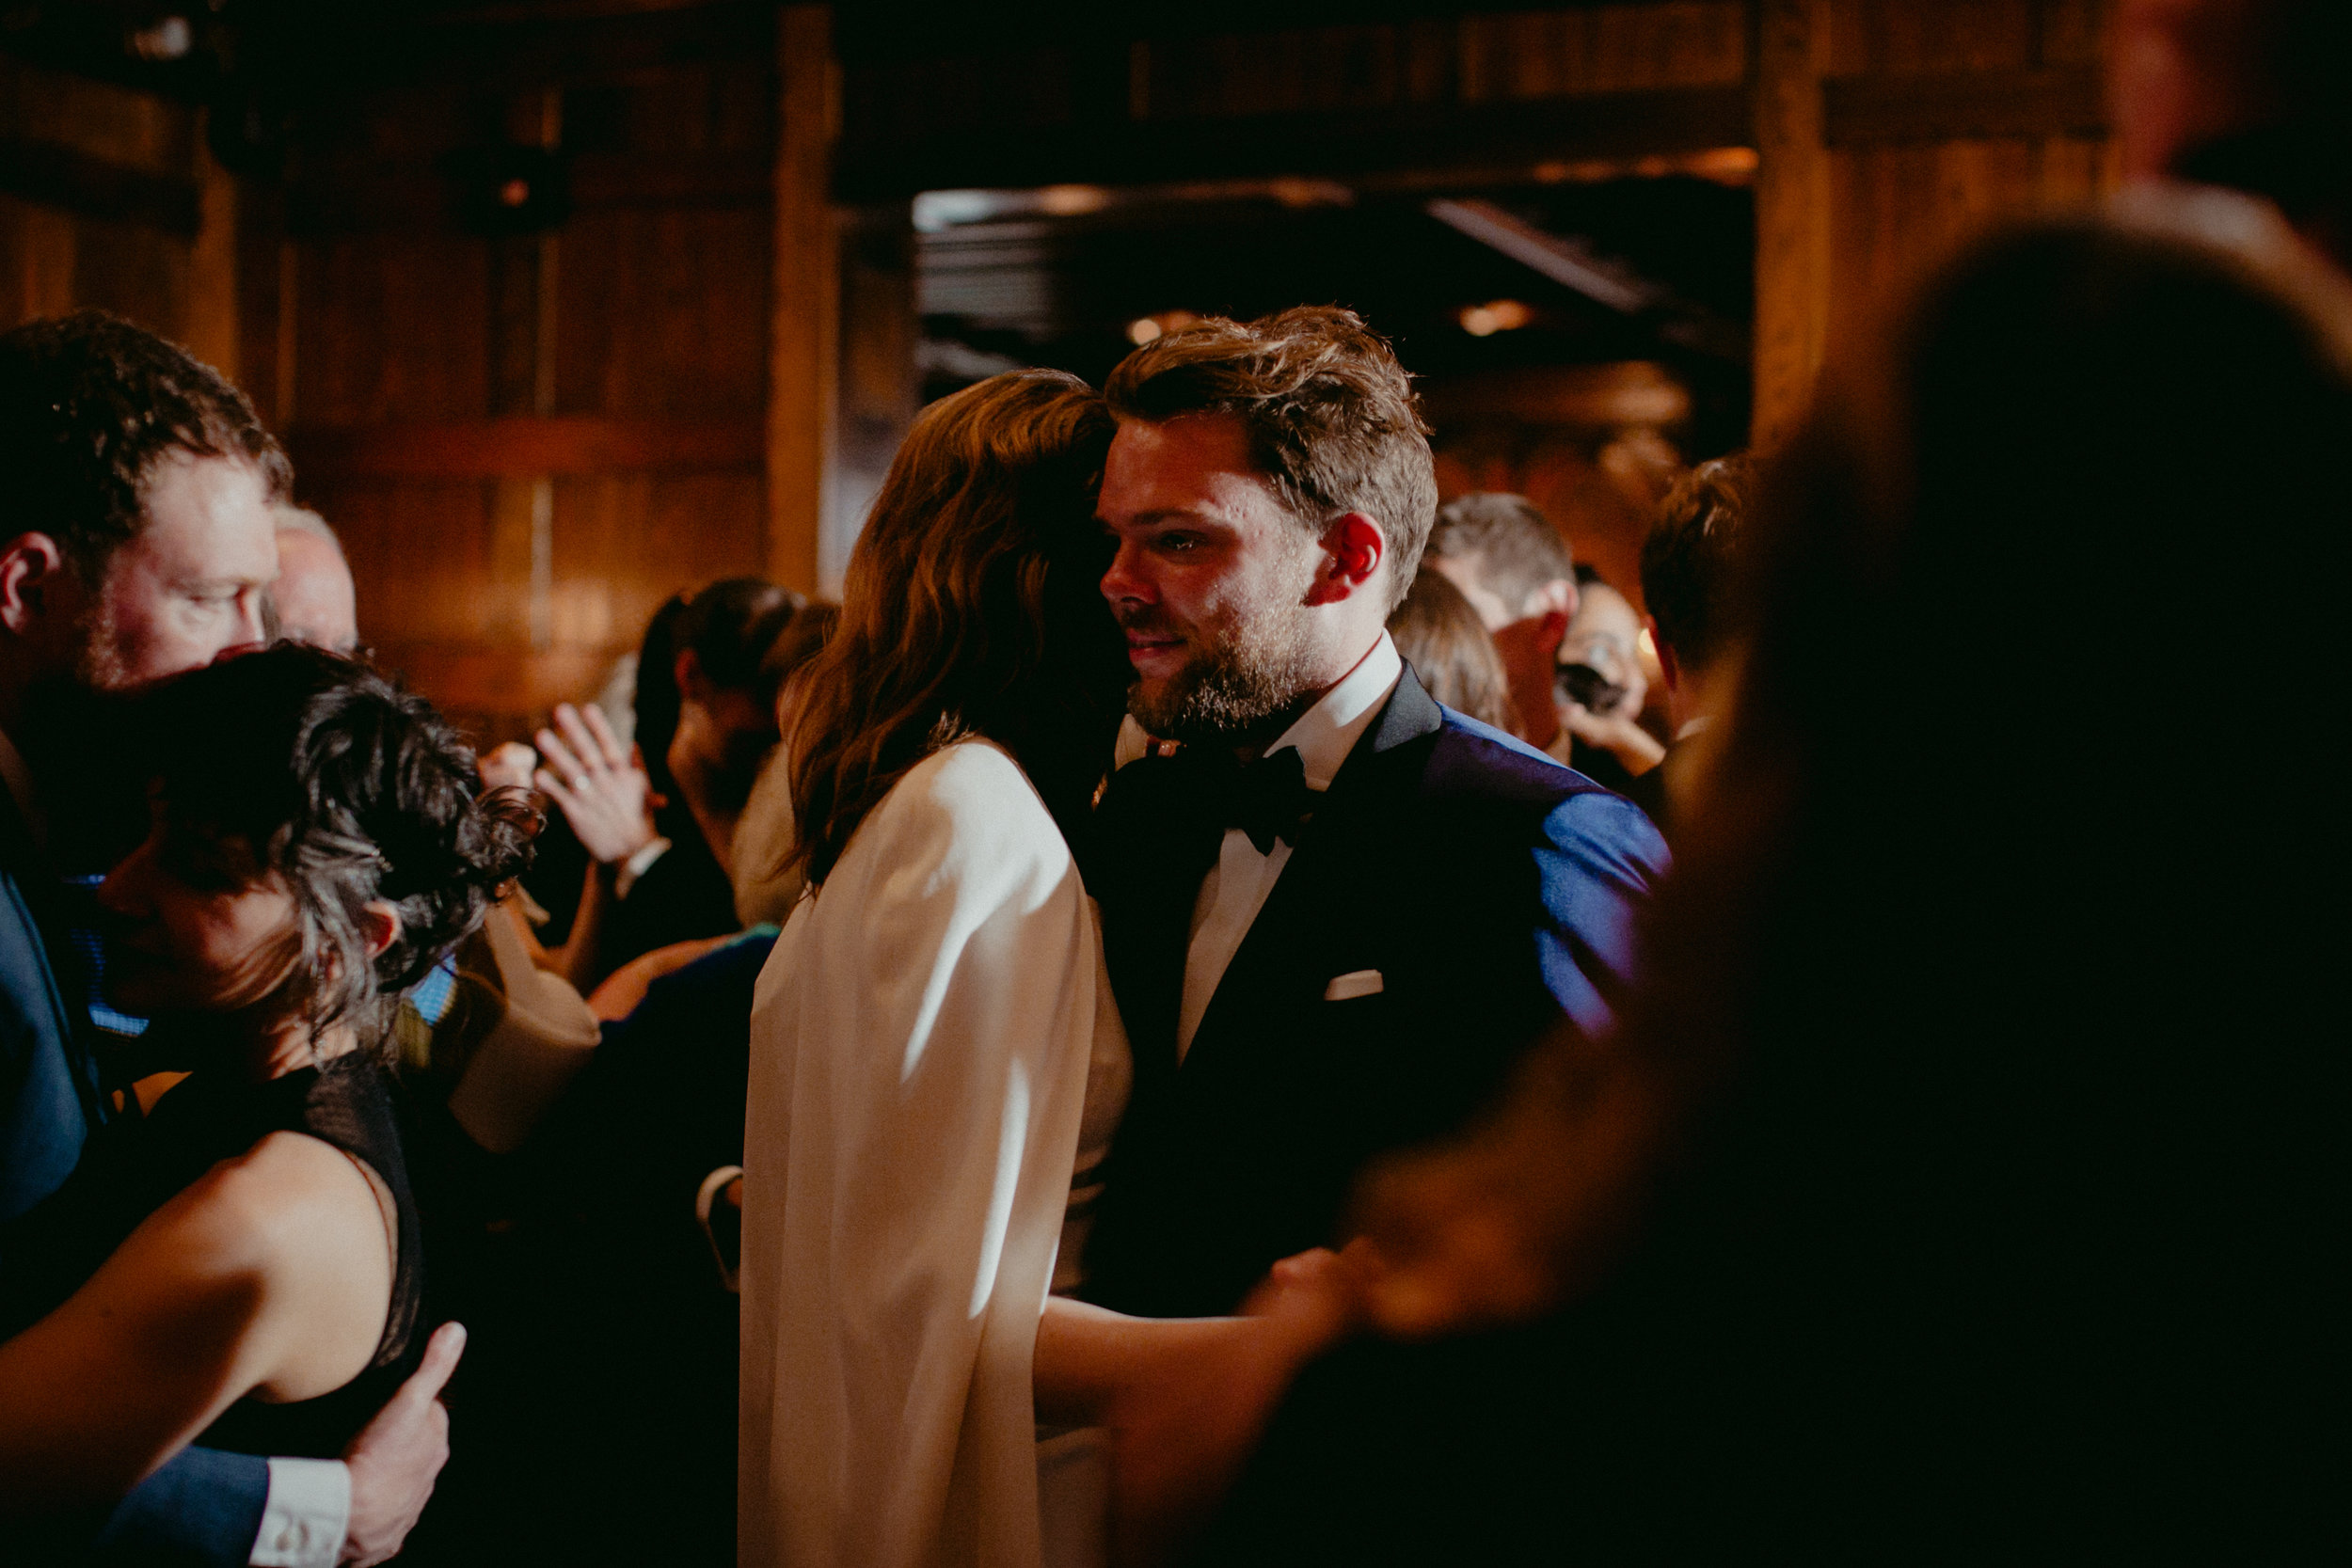 Tiger_House_The_Inn_at_Hudson-Wedding_Chellise_Michael_Photography-420.jpg